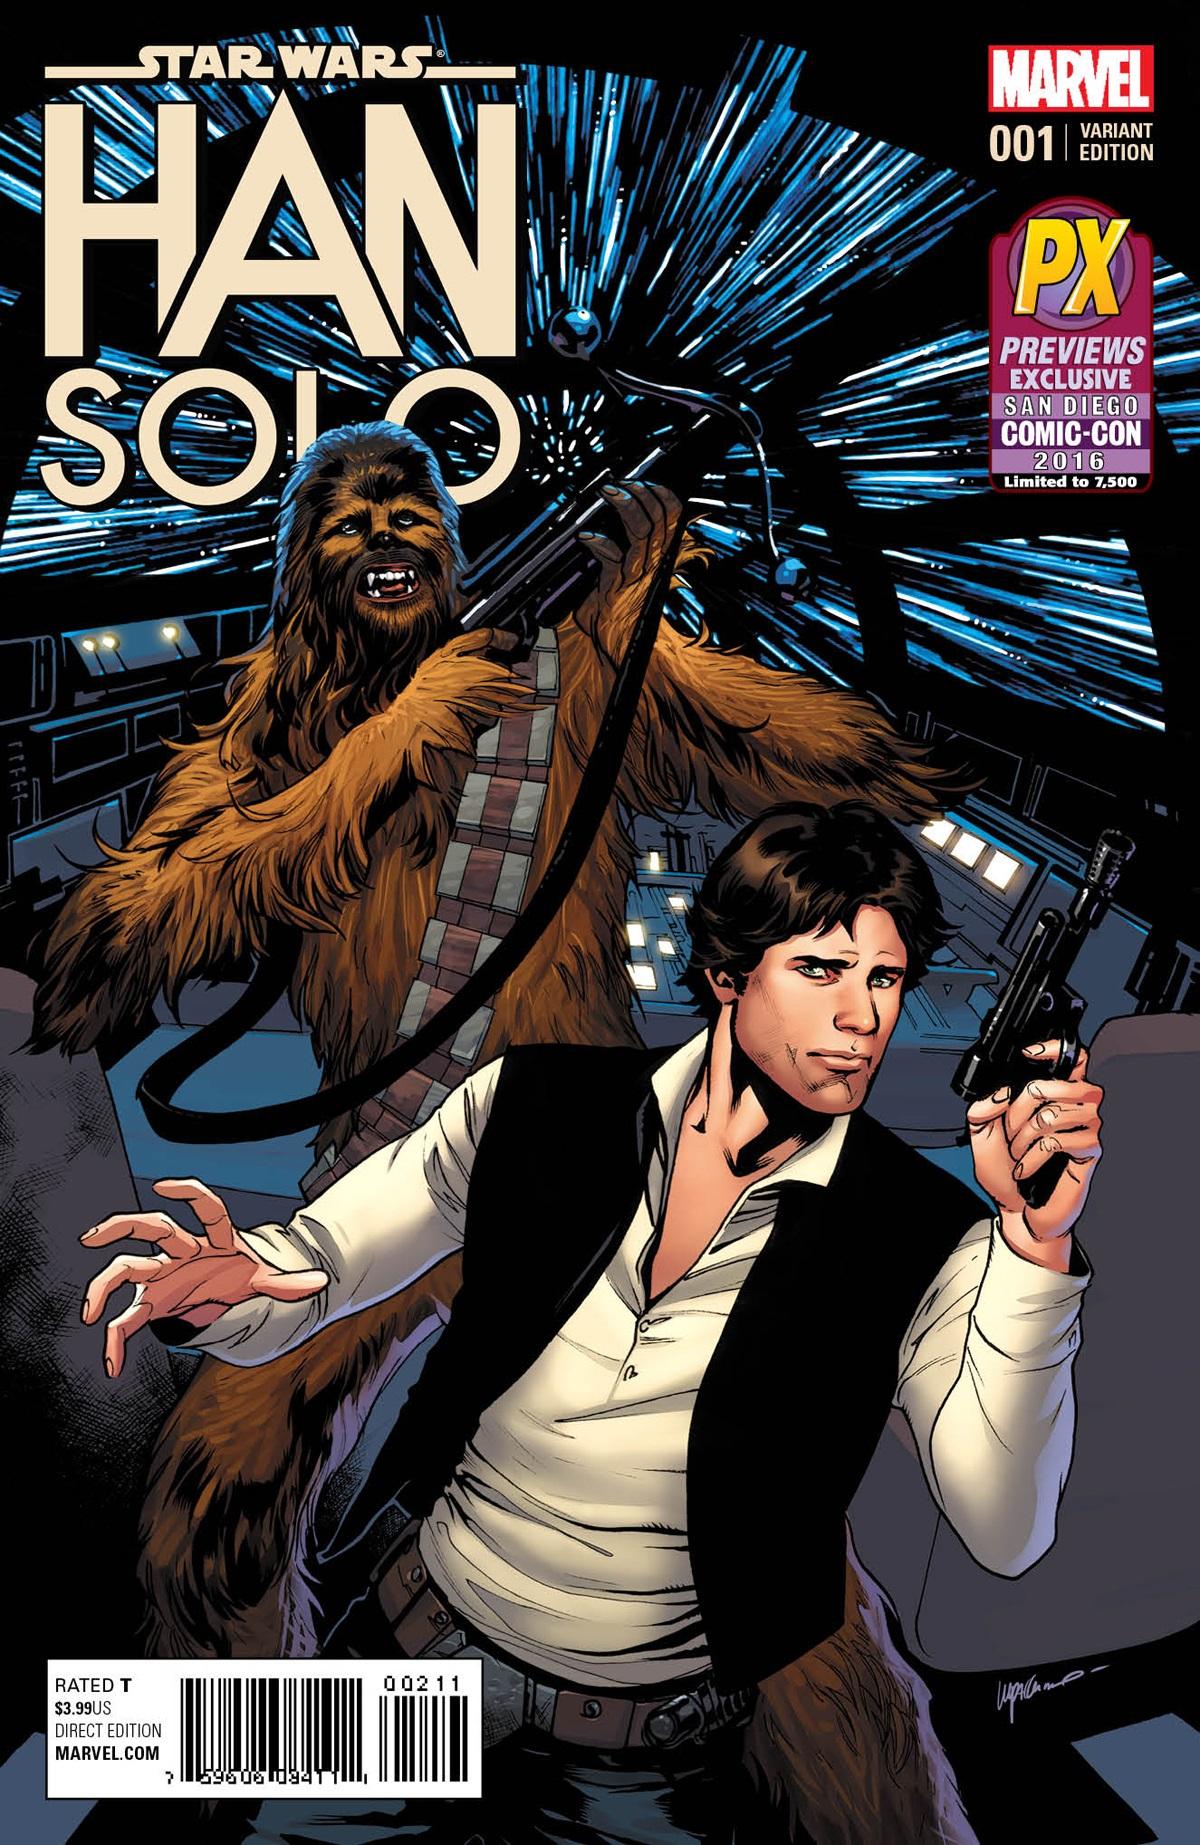 Image - Star Wars Han Solo 1 Lupacchino.jpg | Wookieepedia ...